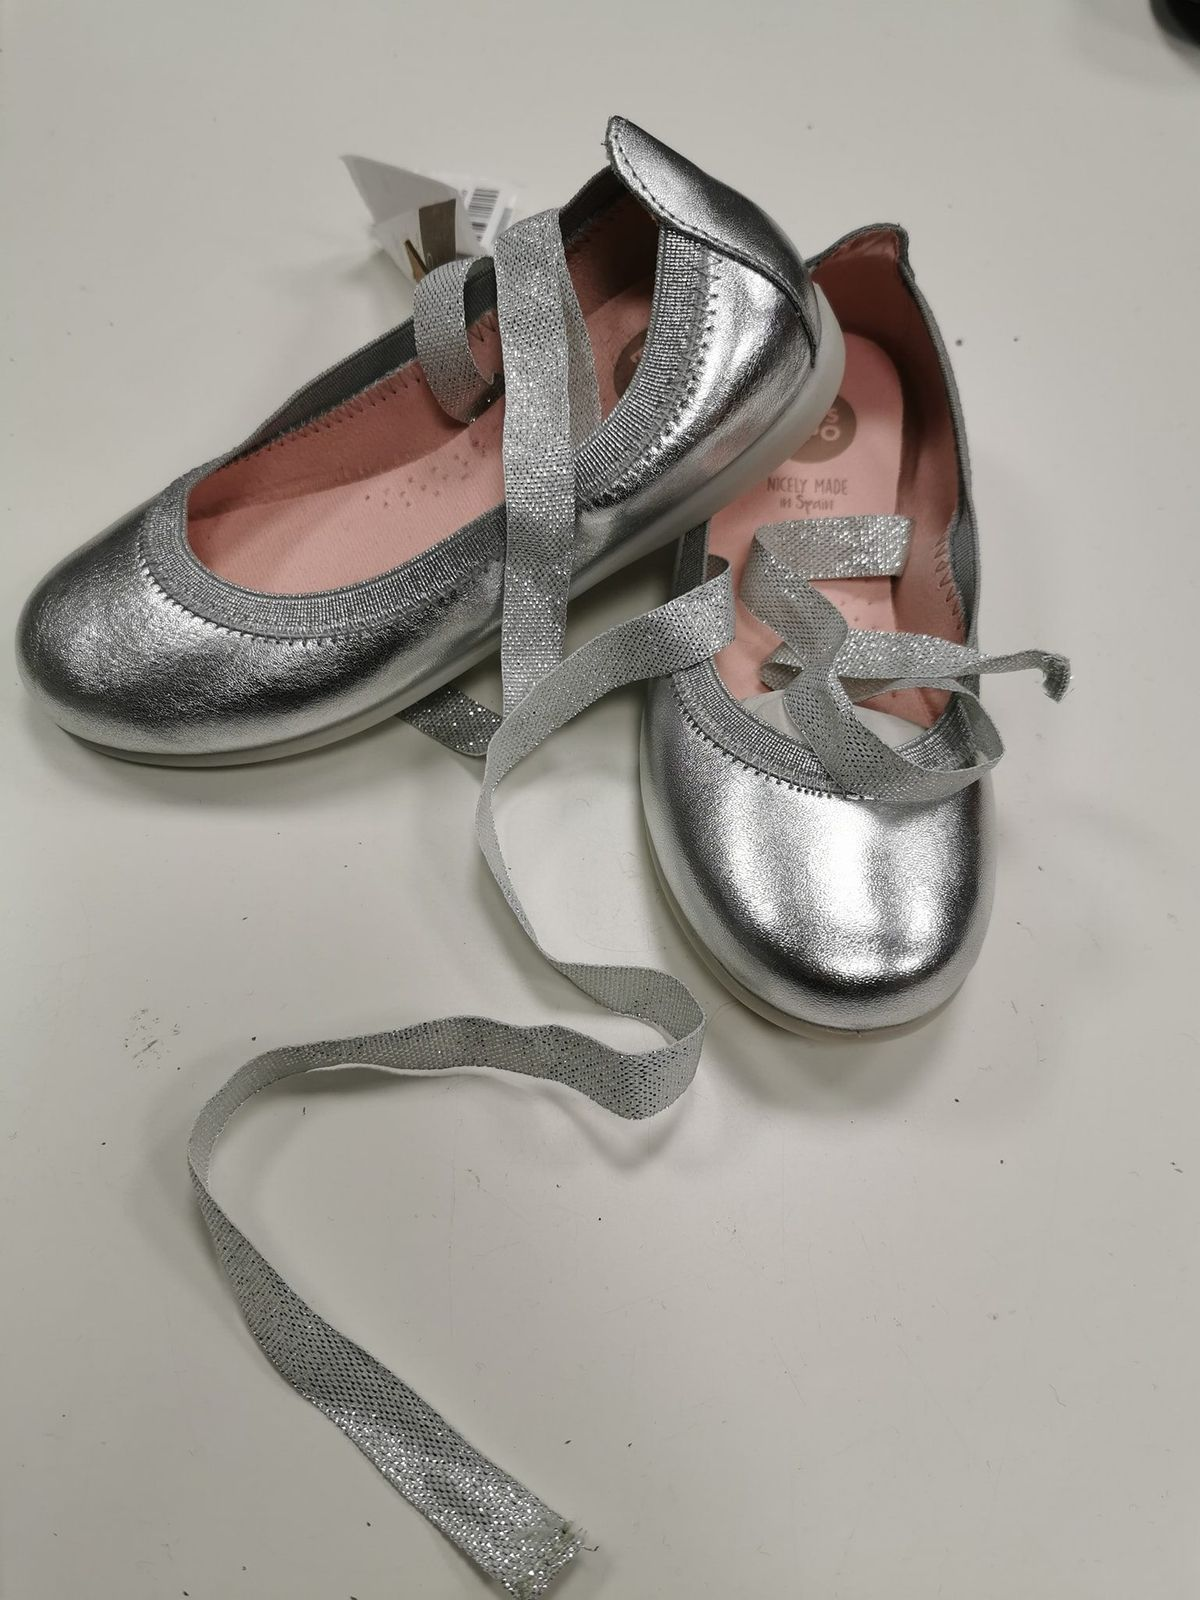 Gios eppo ballerine nuove argento N 31 694 Euro 38,00